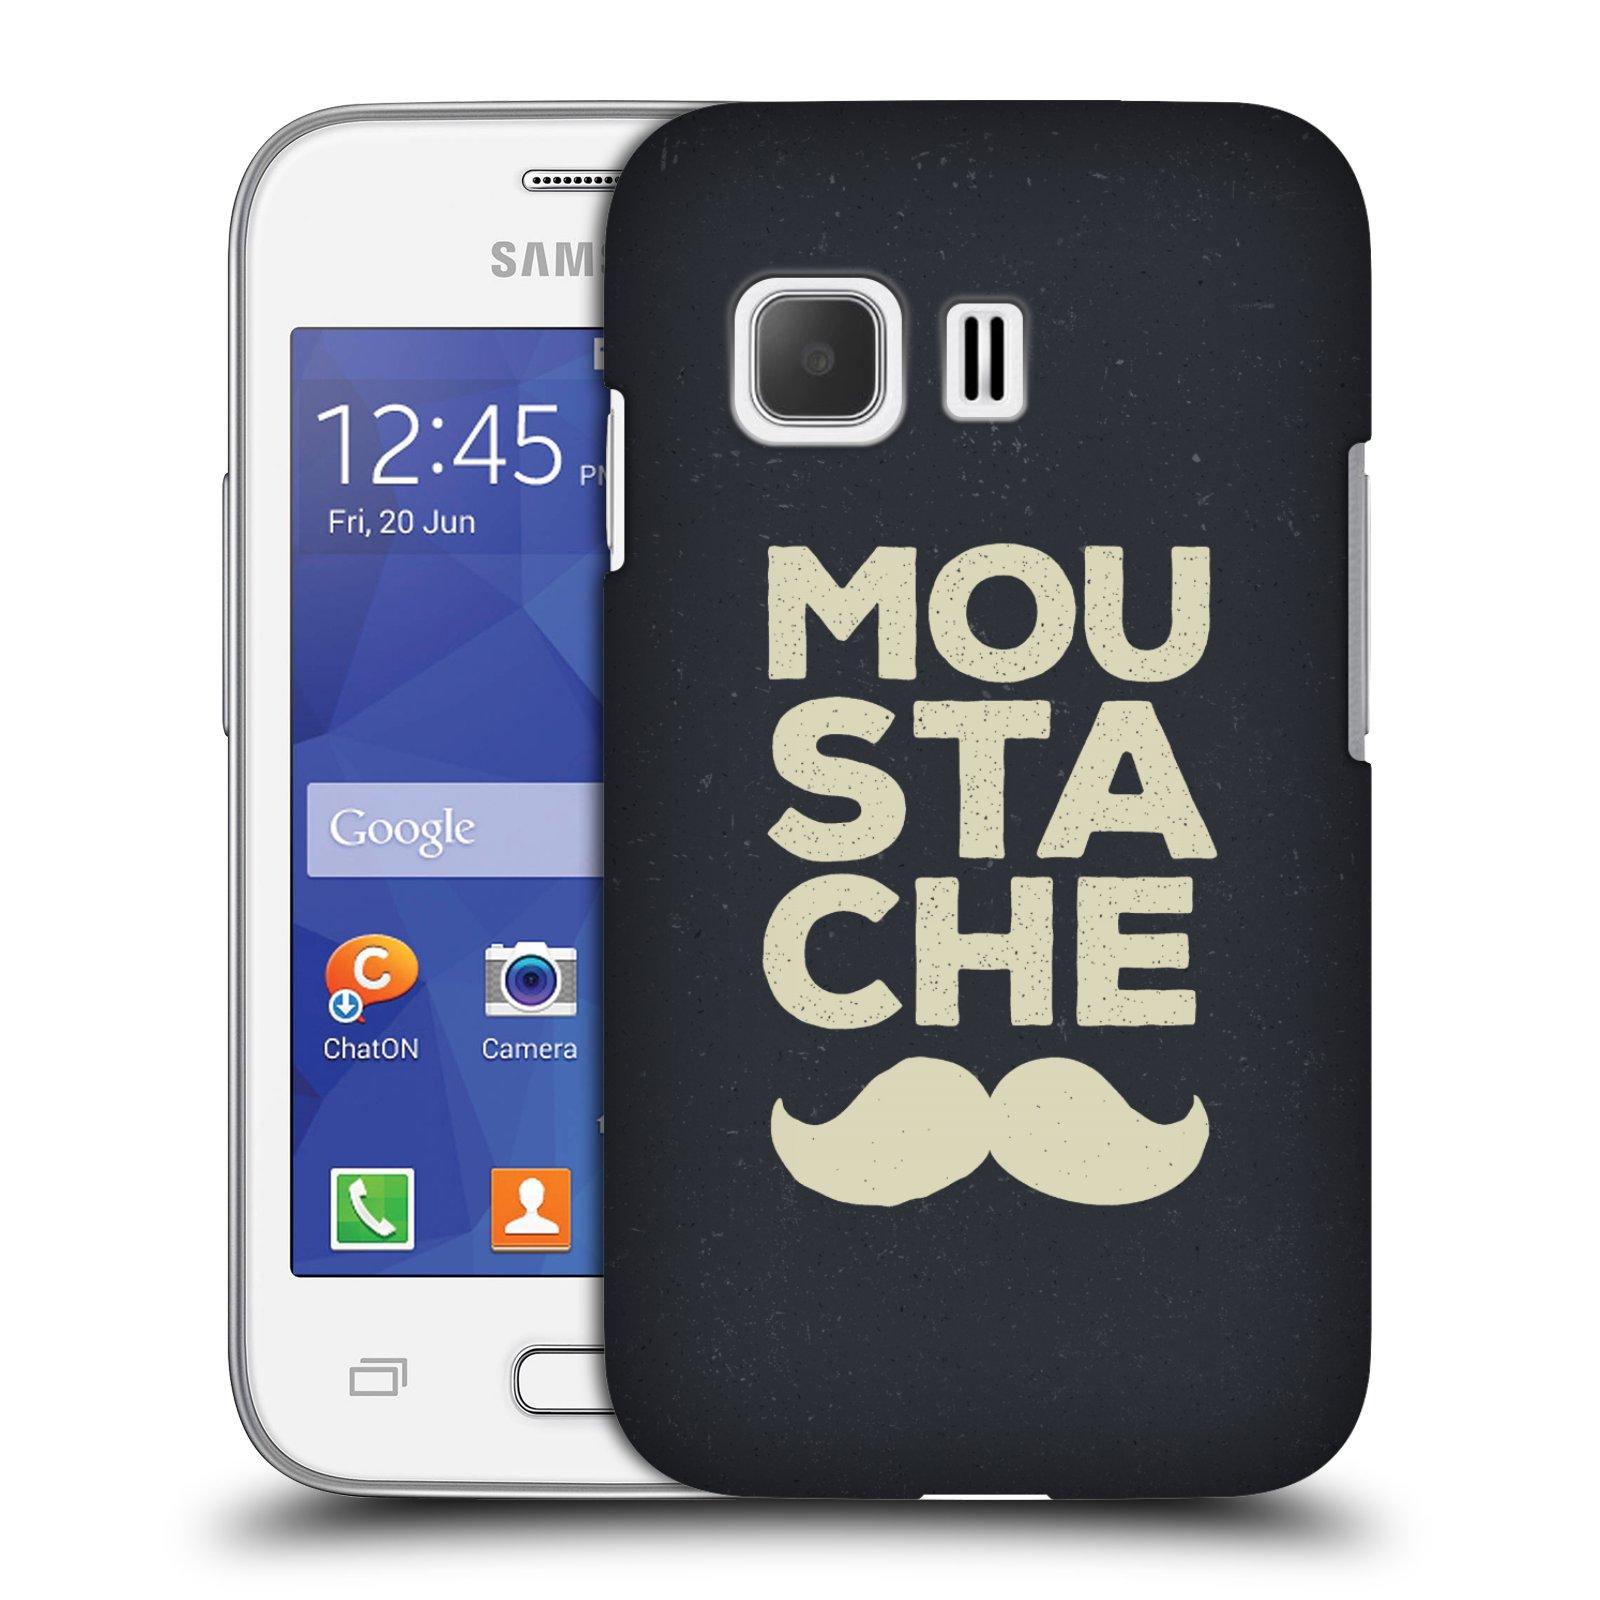 Plastové pouzdro na mobil Samsung Galaxy Young 2 HEAD CASE KNÍR MOU STA CHE (Plastový kryt či obal na mobilní telefon Samsung Galaxy Young 2 SM-G130)